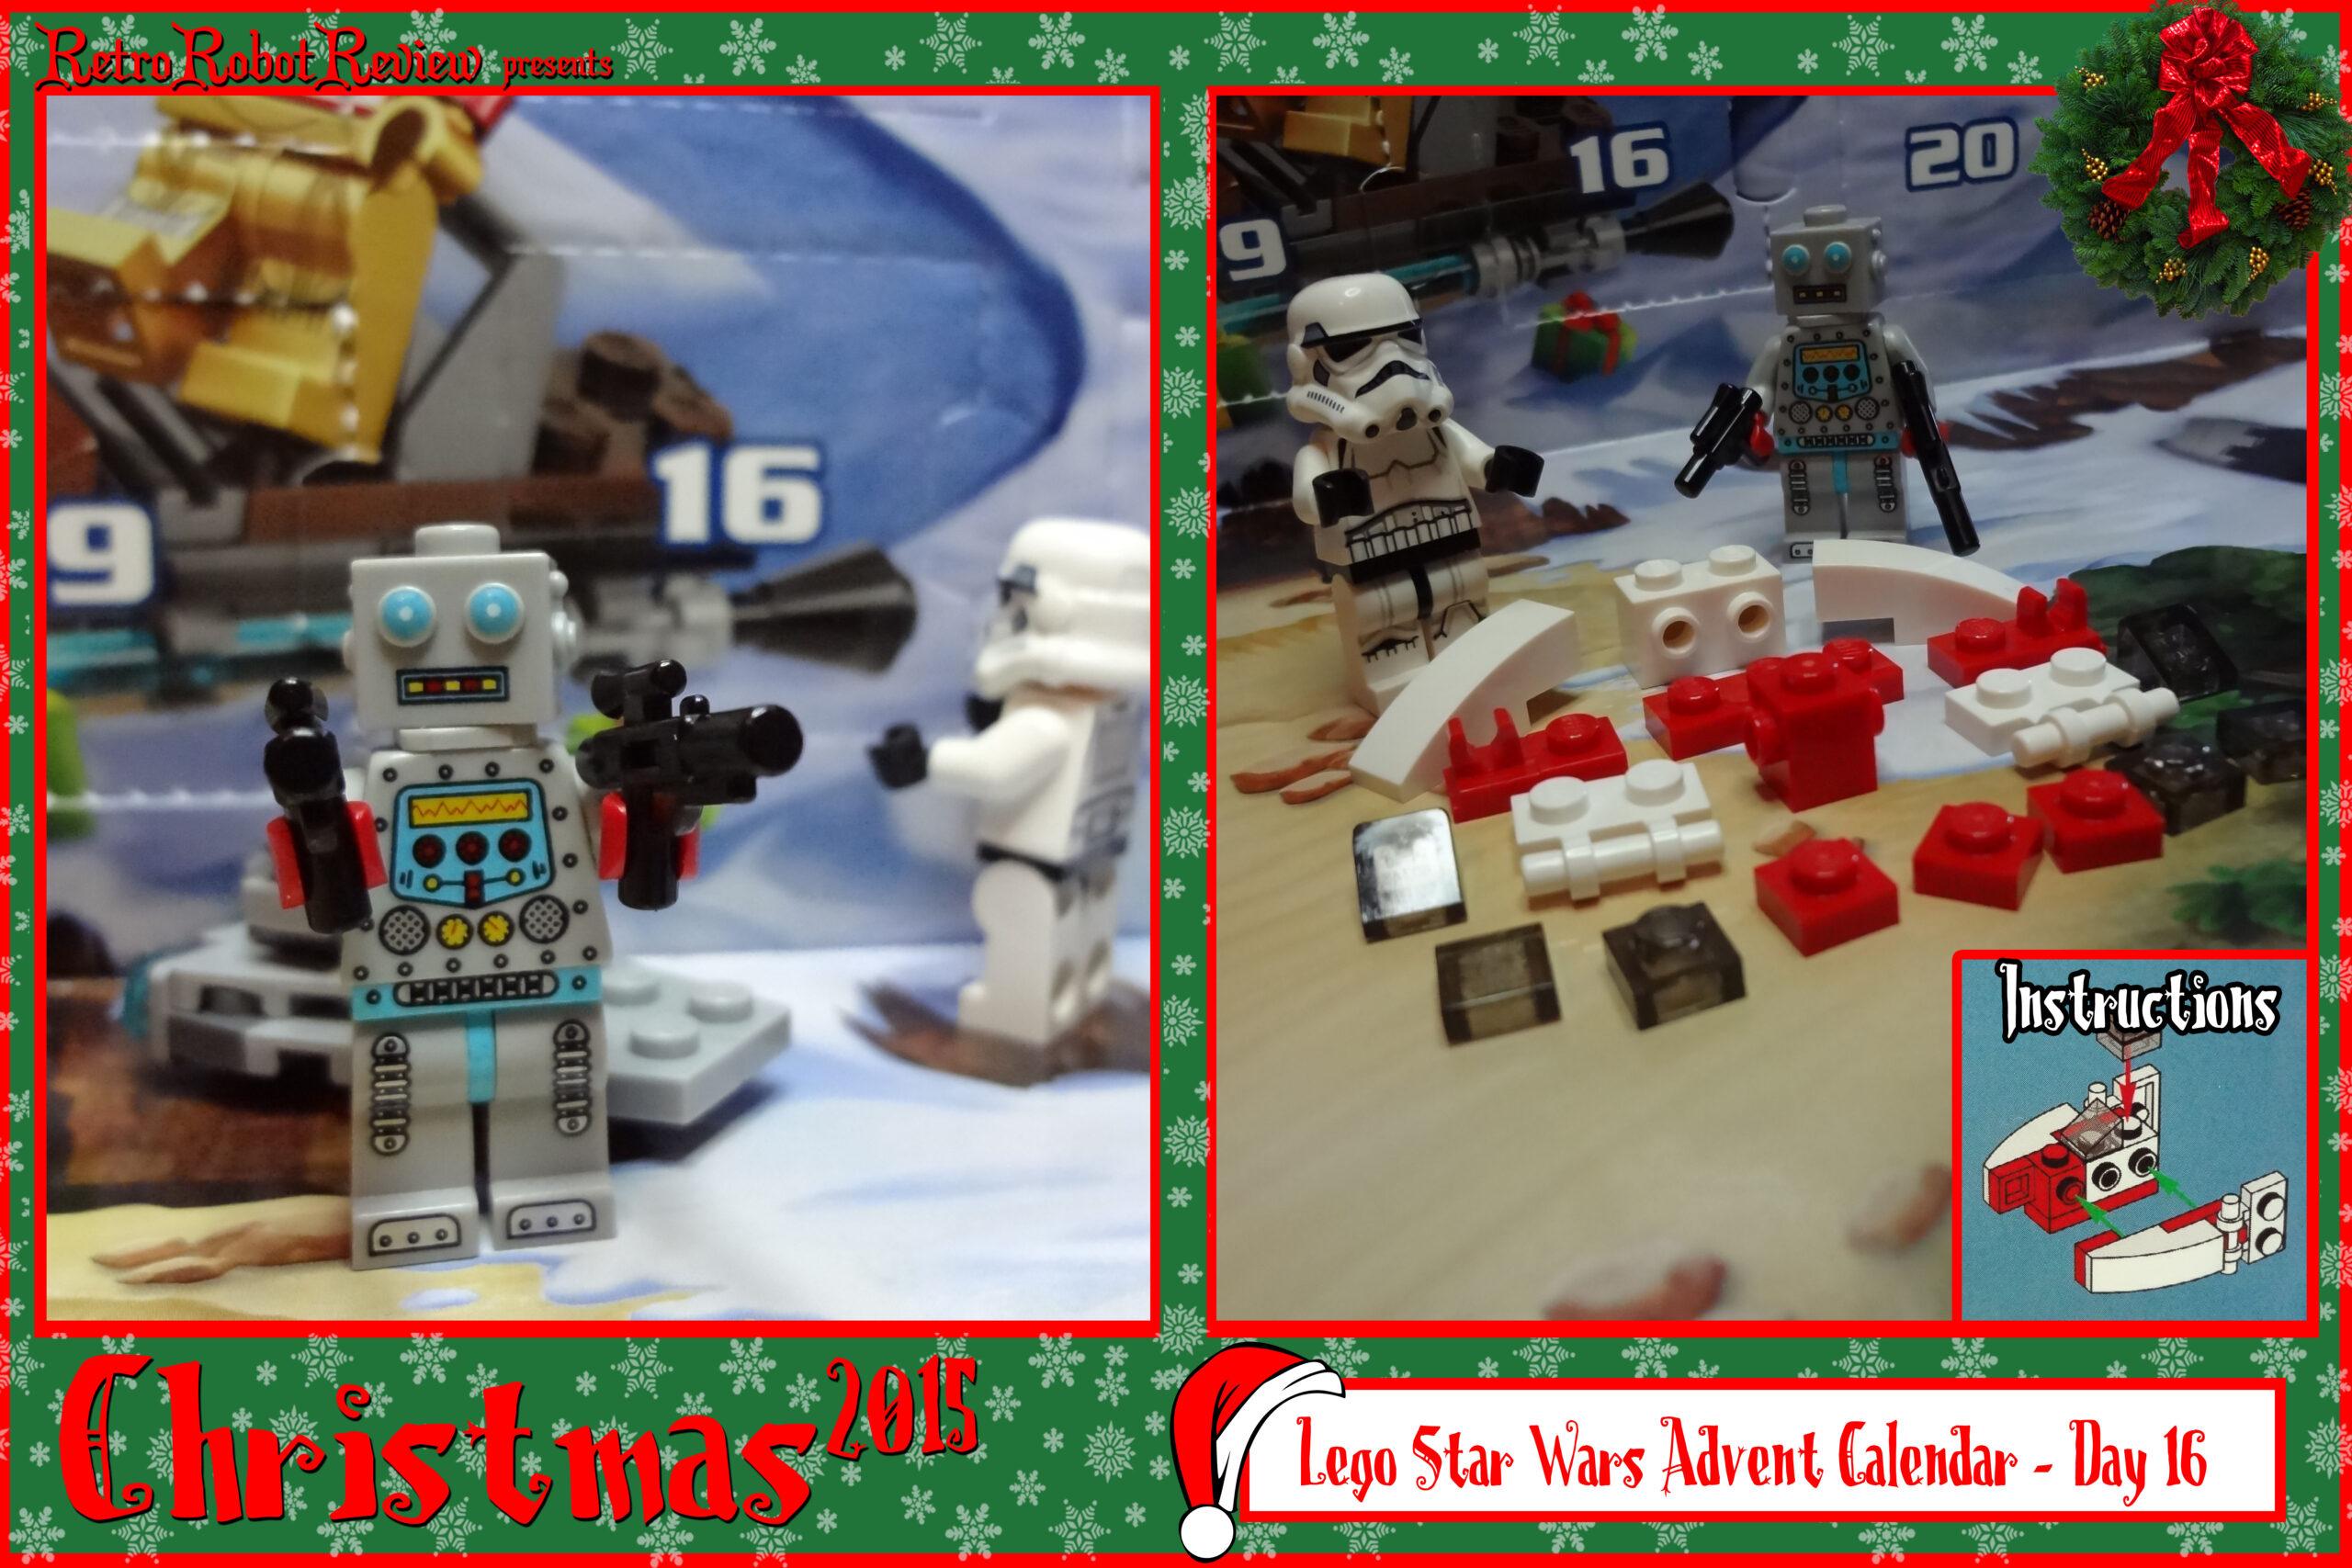 Lego Star Wars Advent Calendar  Day 16 regarding Lego Star Wars Advent Calendar Instructions